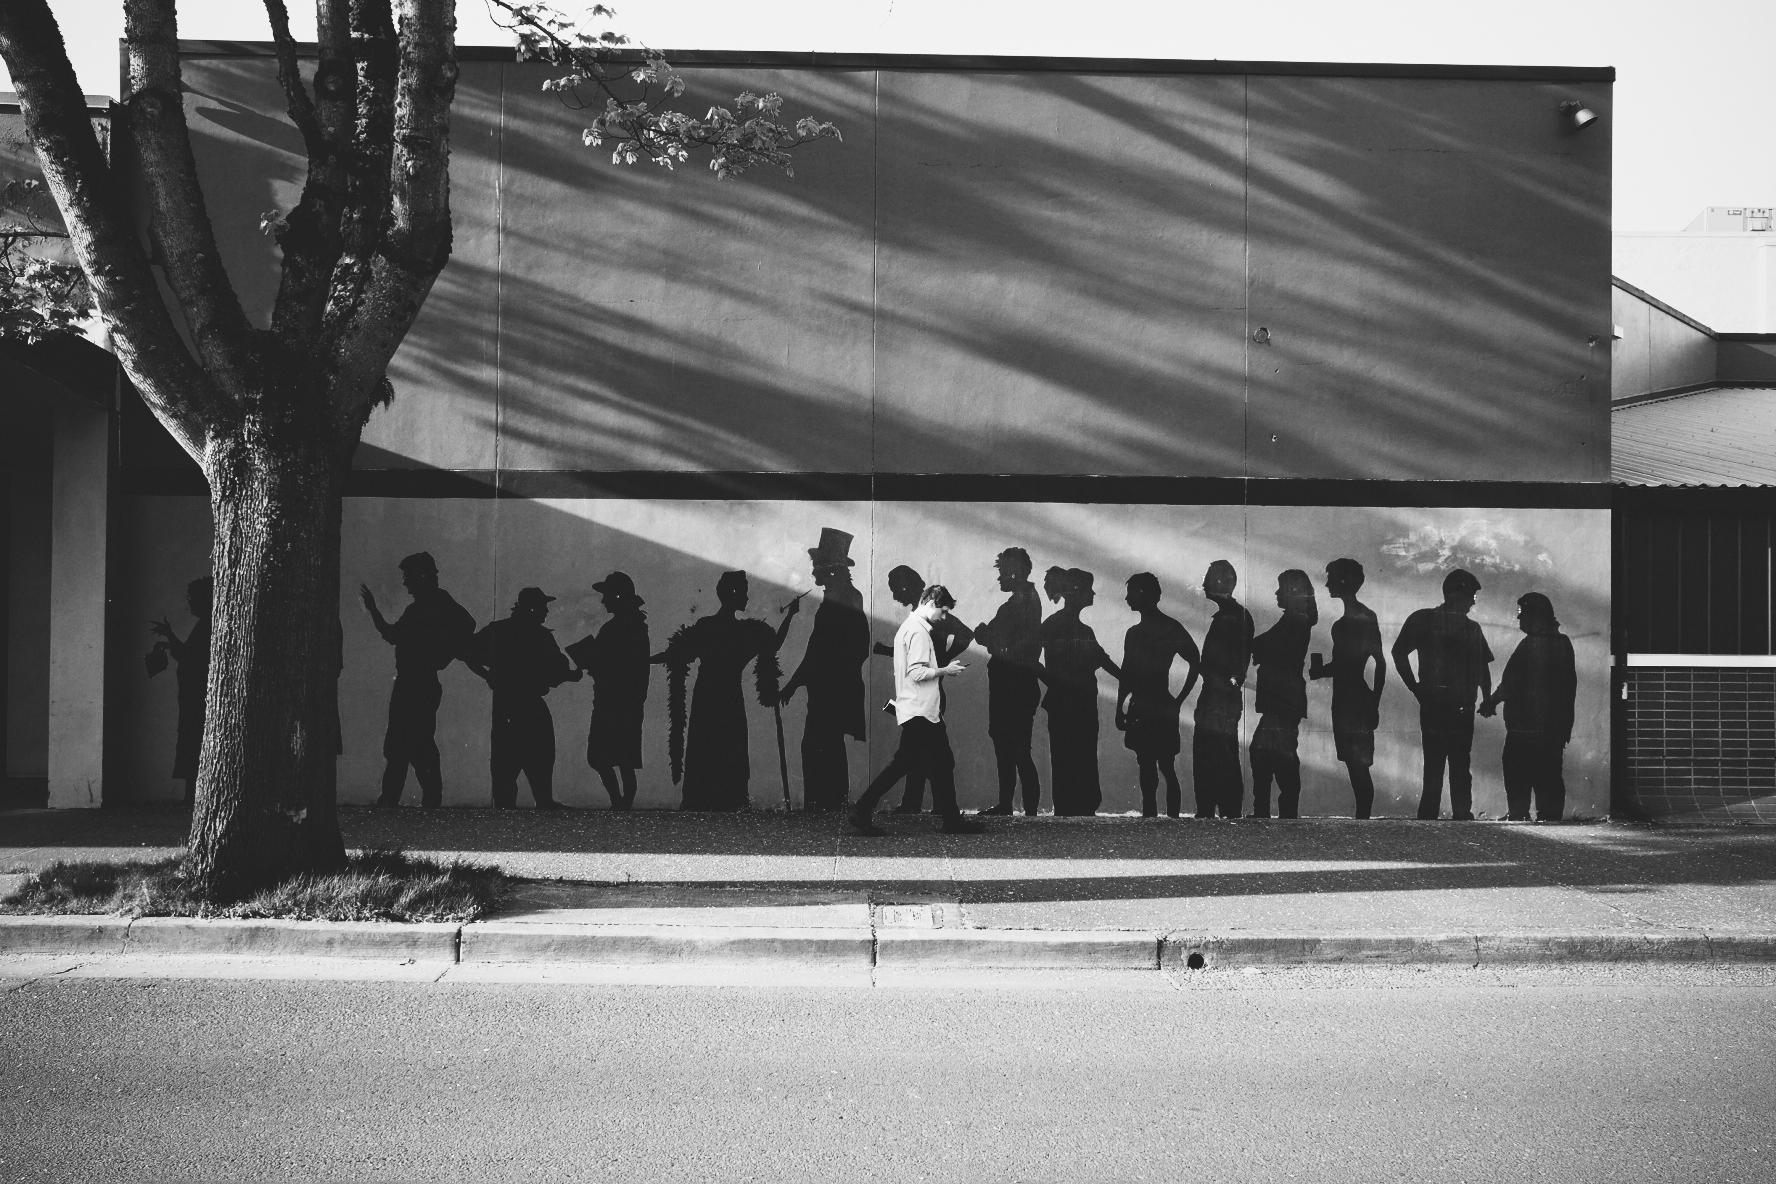 InFormation. Downtown Eugene, Oregon. (c) 2016 Josh Spice